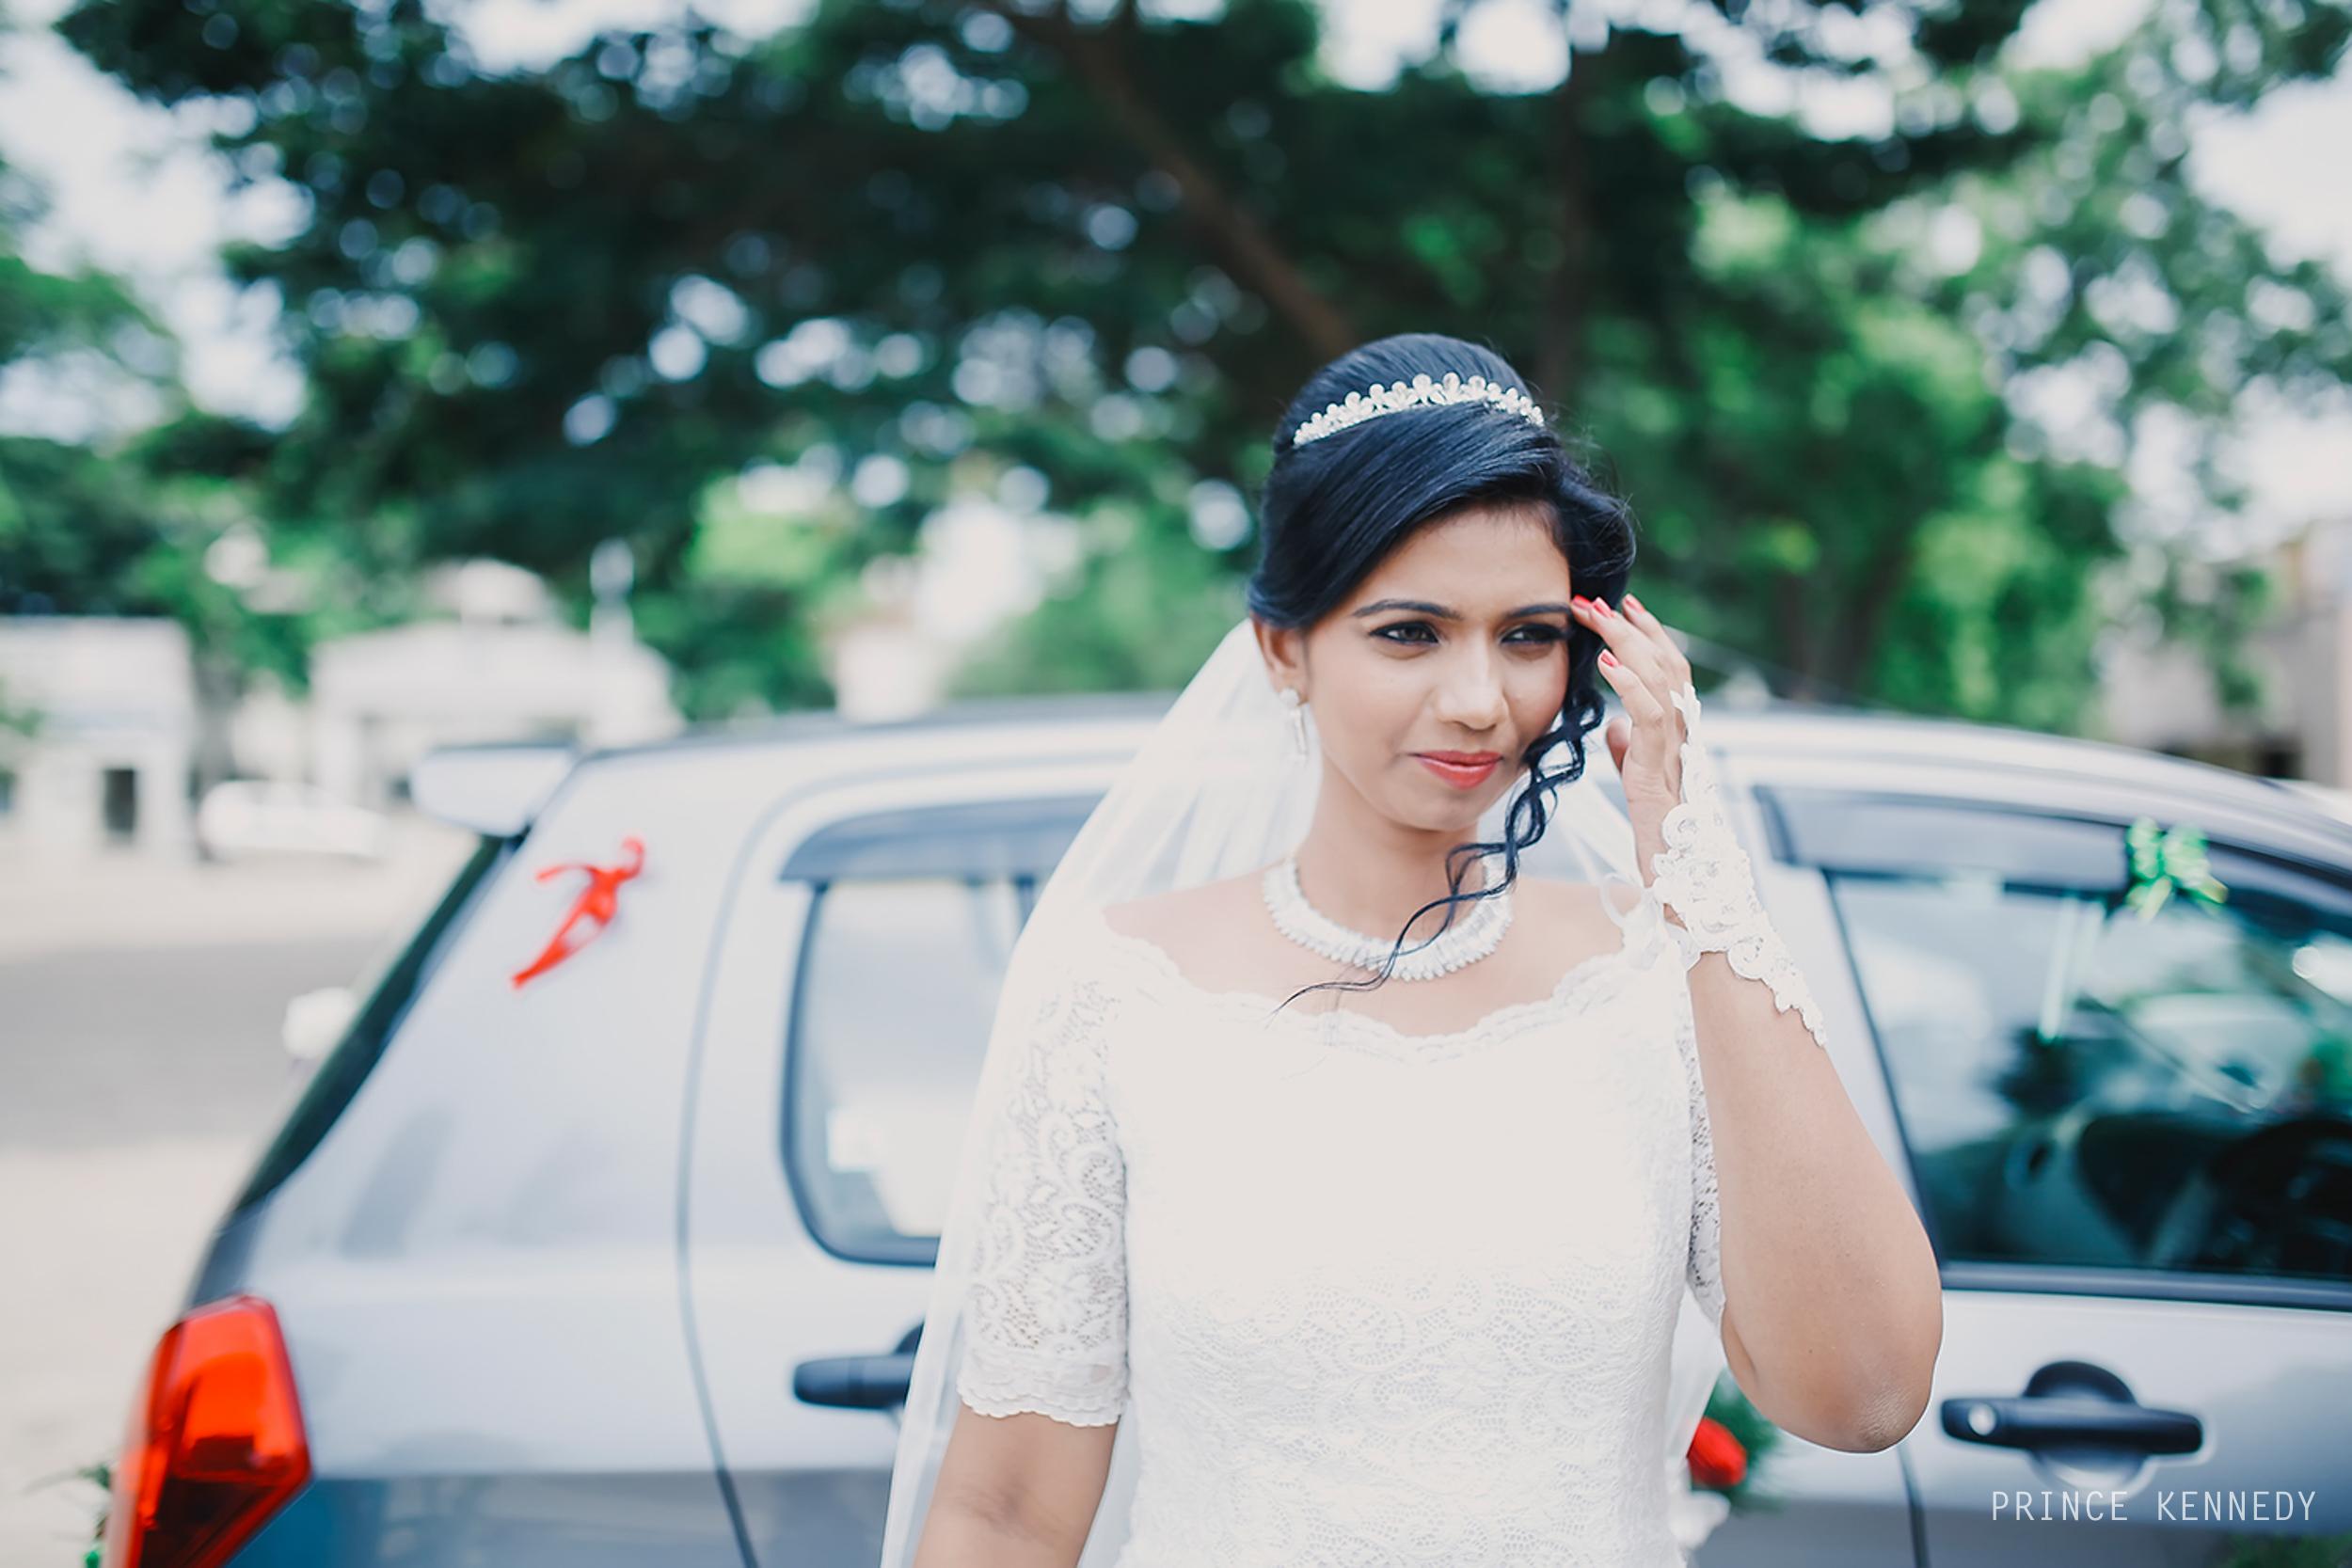 Wedding-weddings-candid-photography-chennai-photographer-best-photography11.jpg